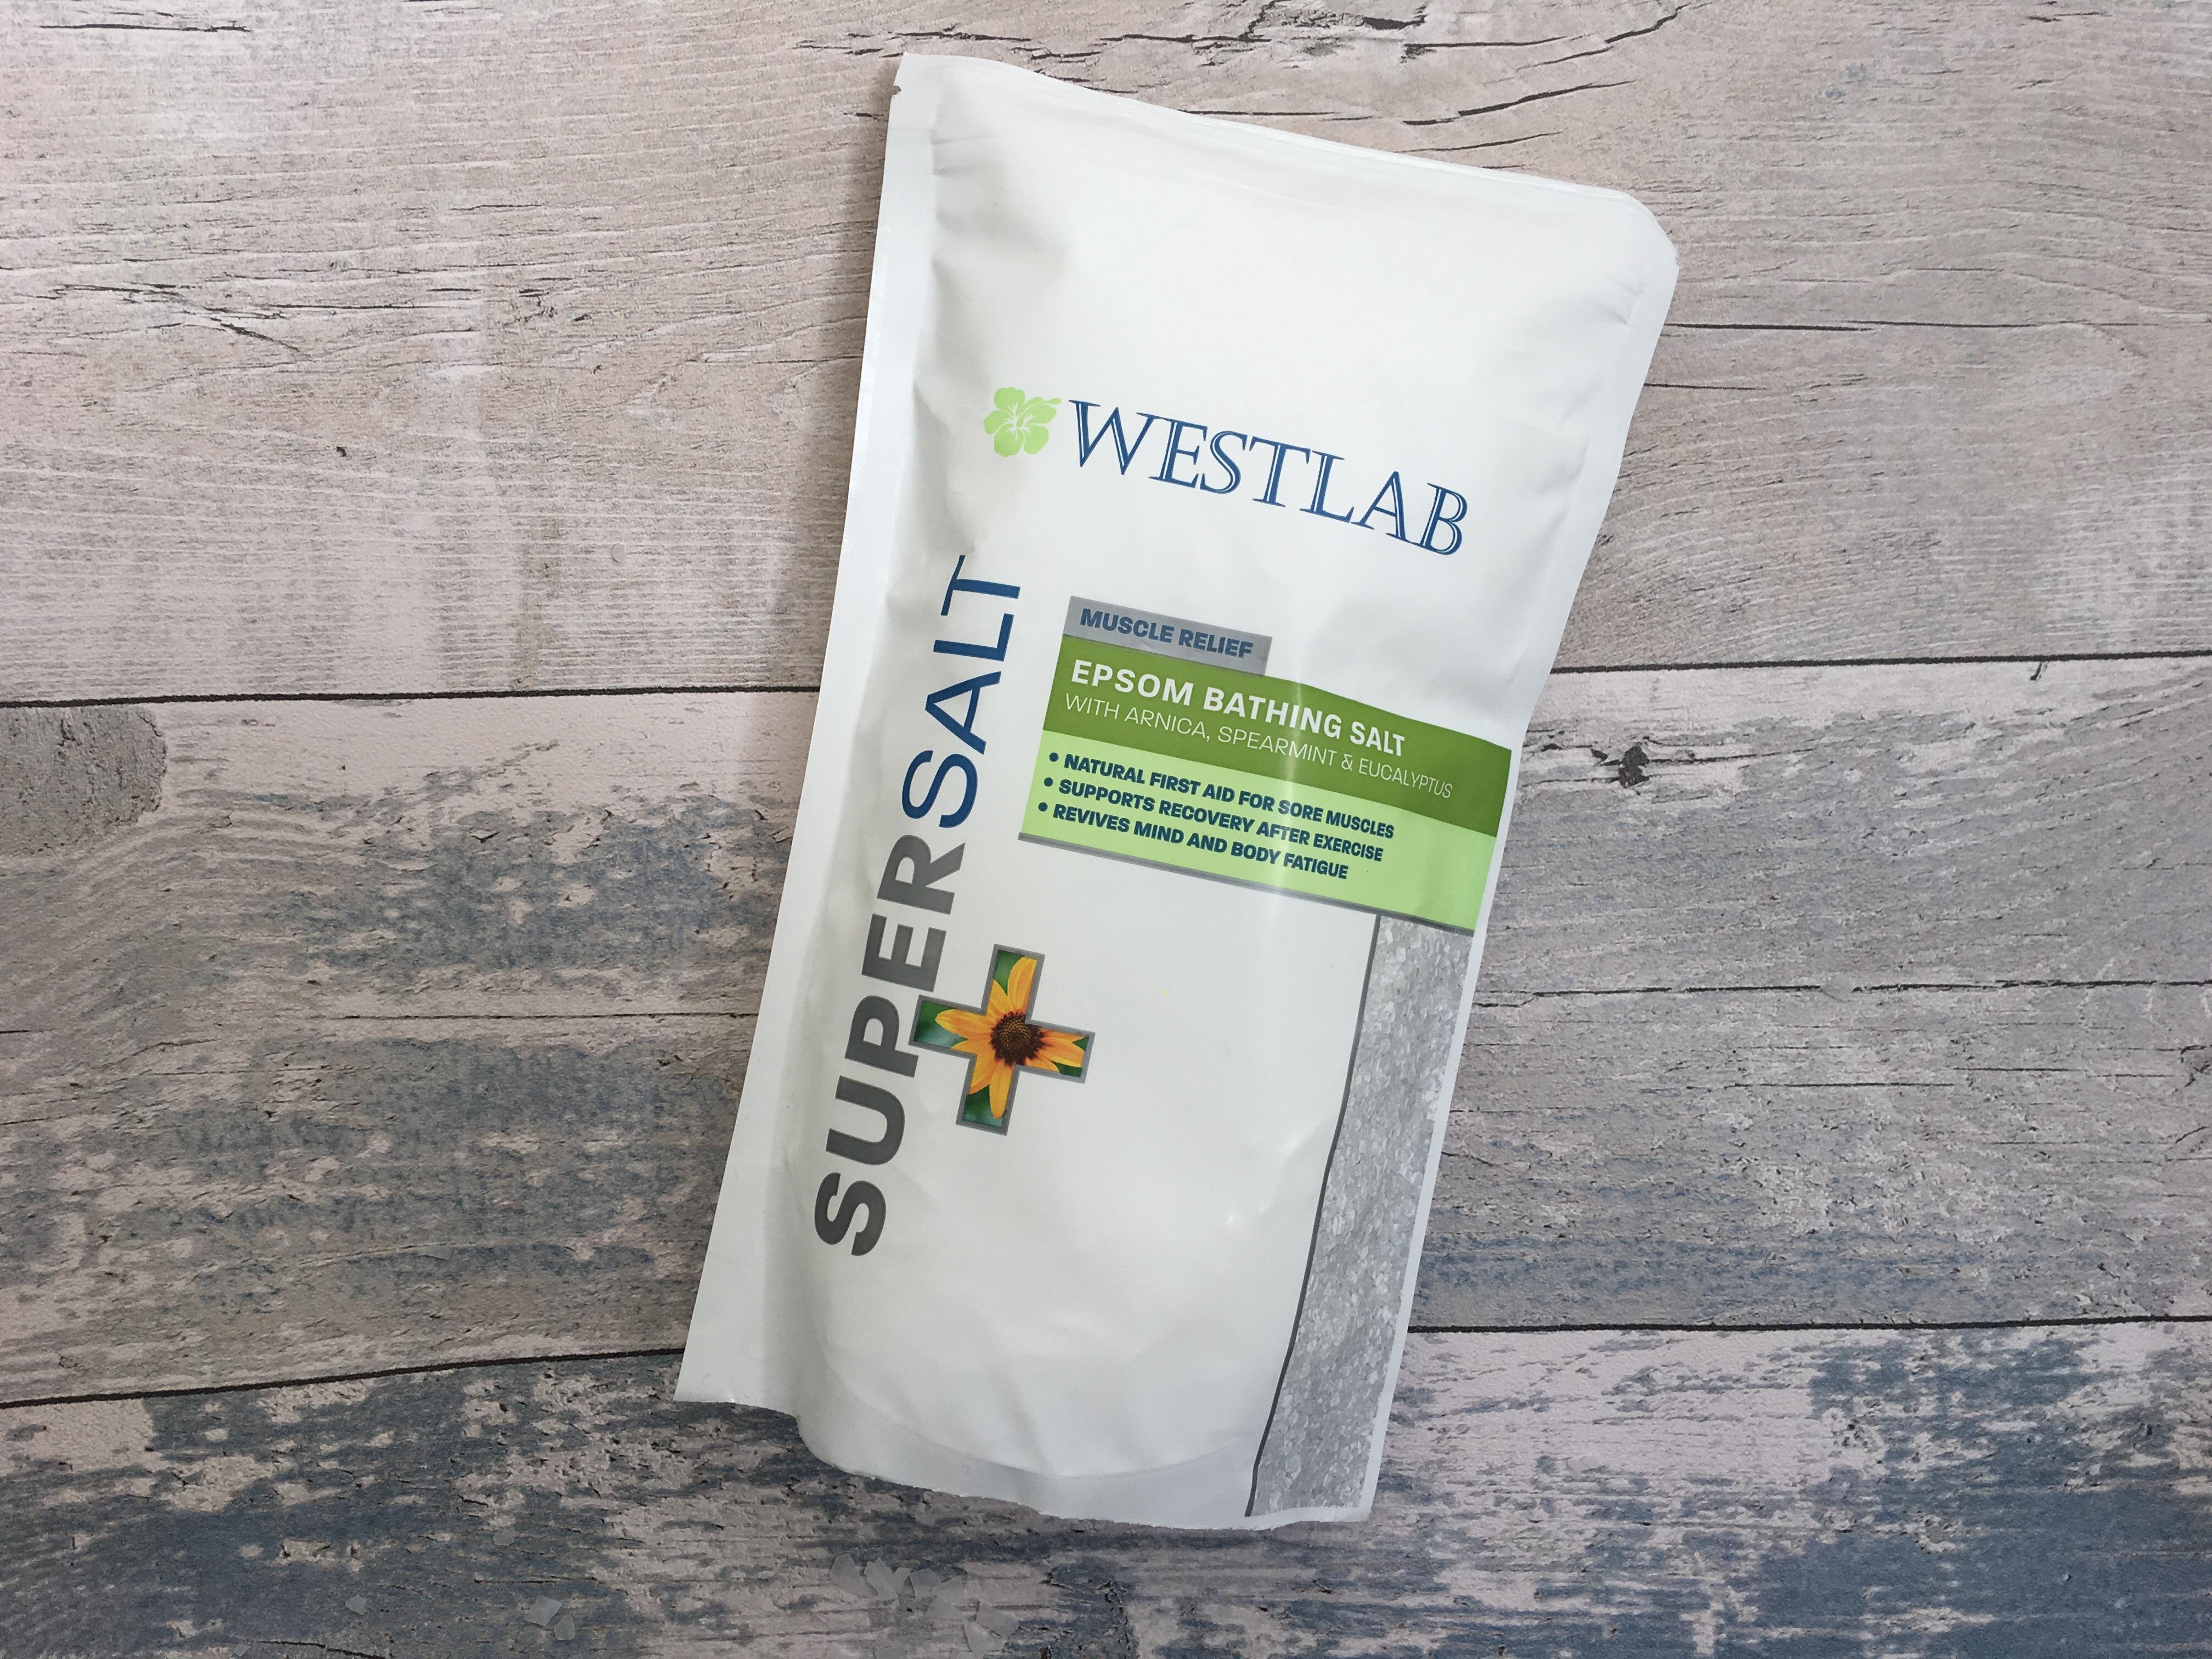 Westlab muscle relief Epsom bathing salt